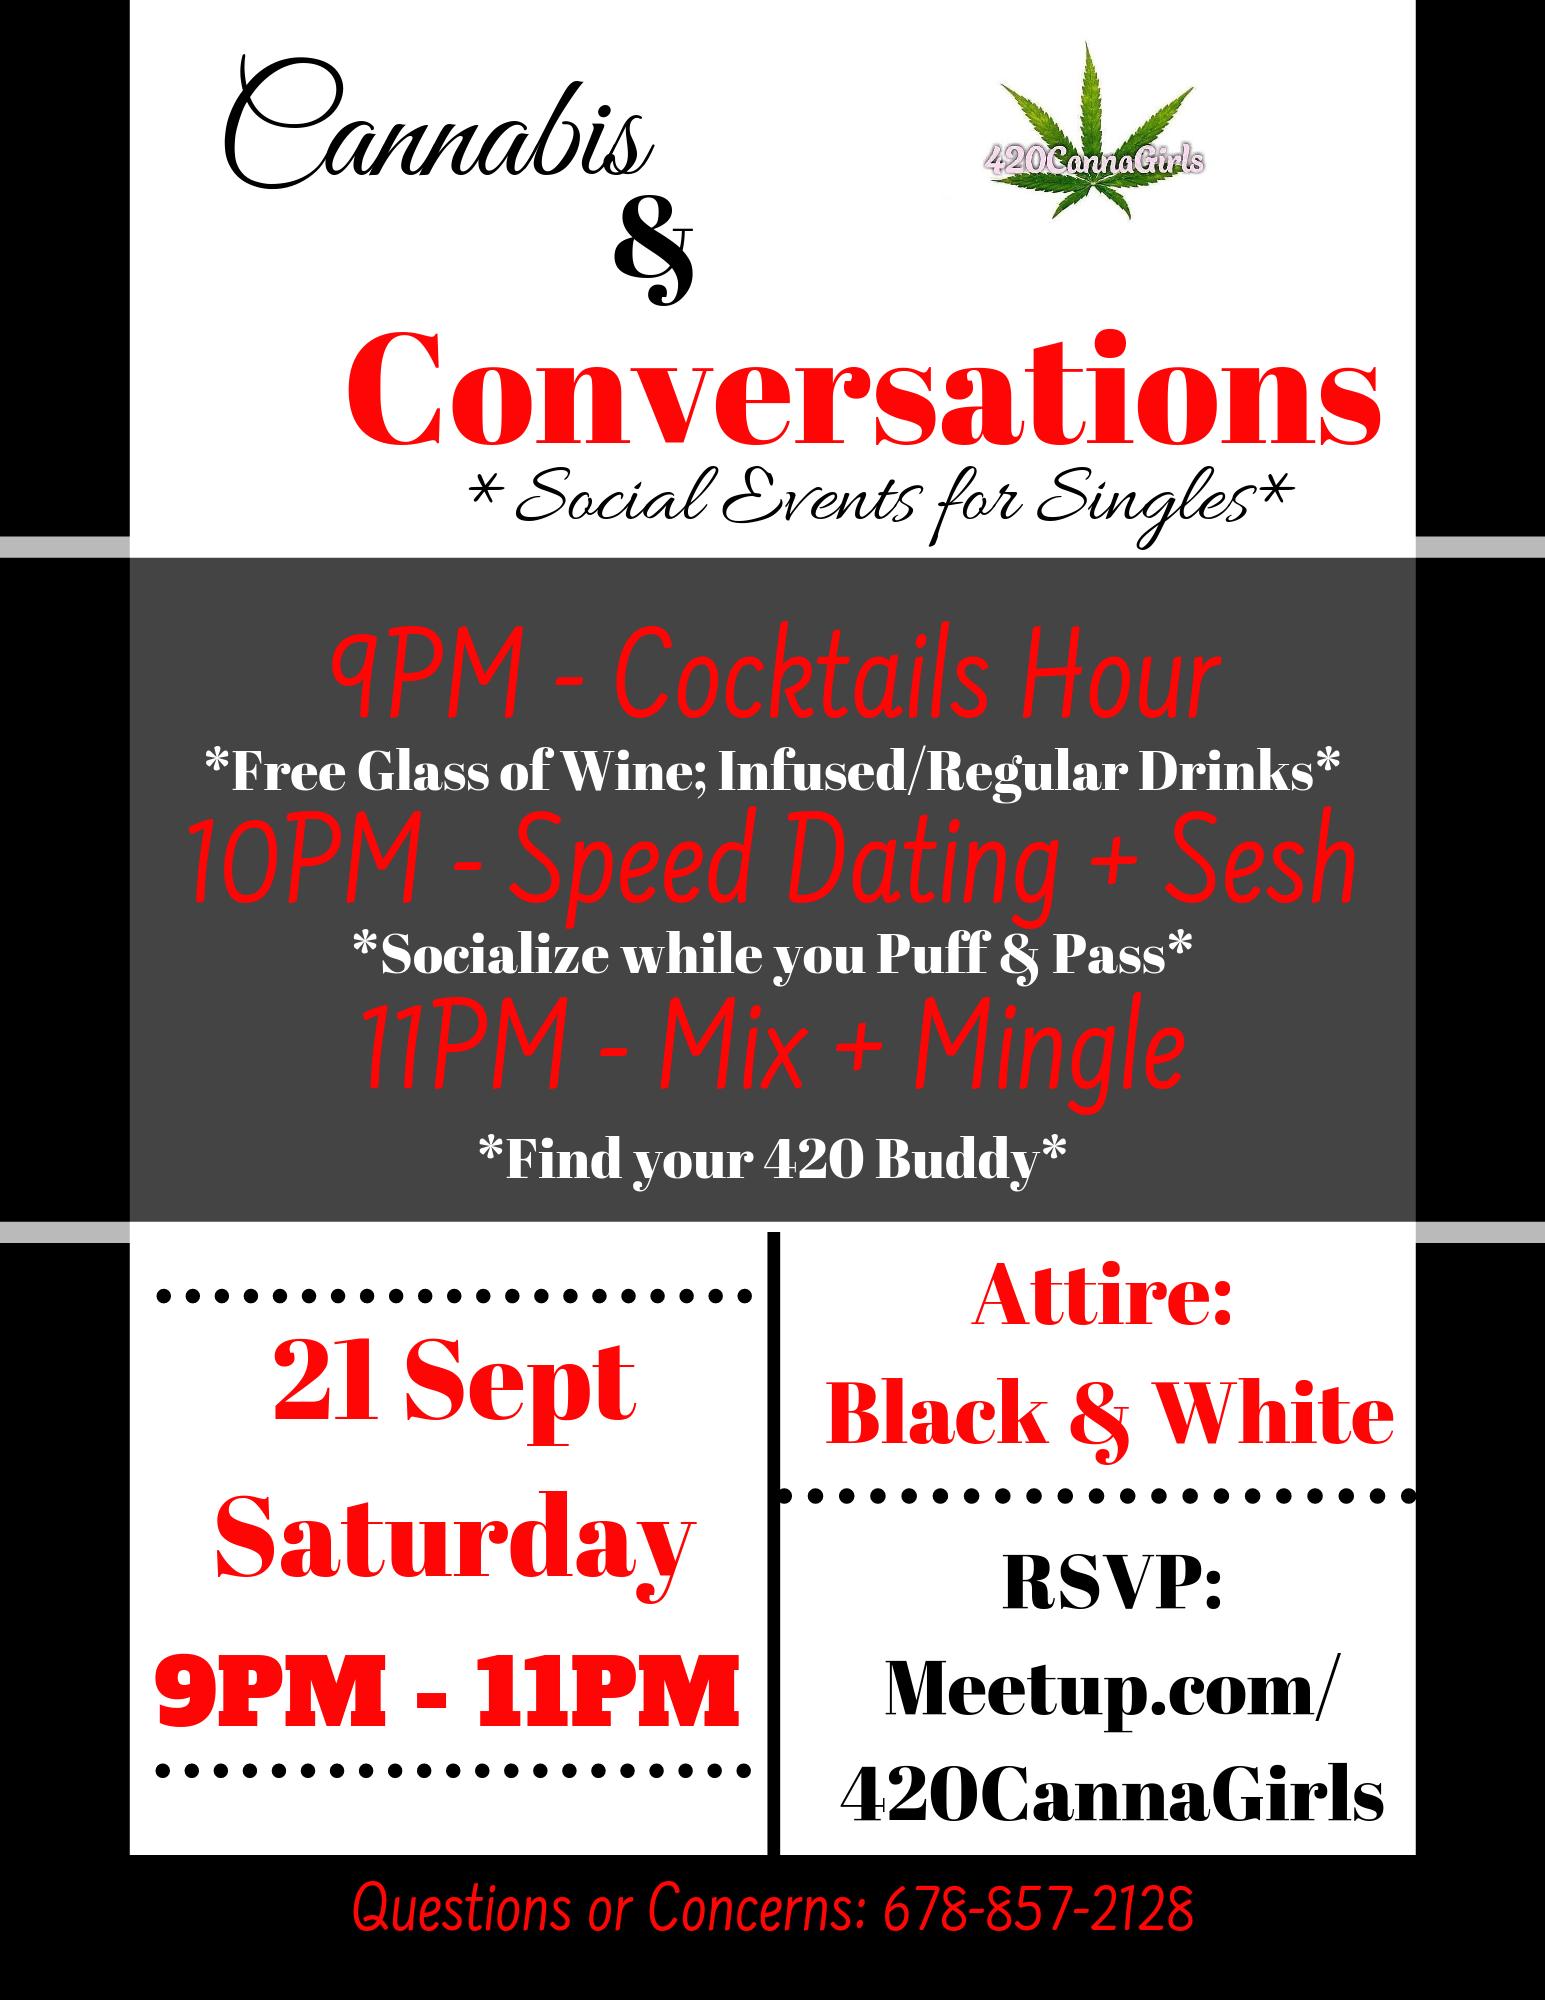 Cannabis + Conversation: Social Event for Singles